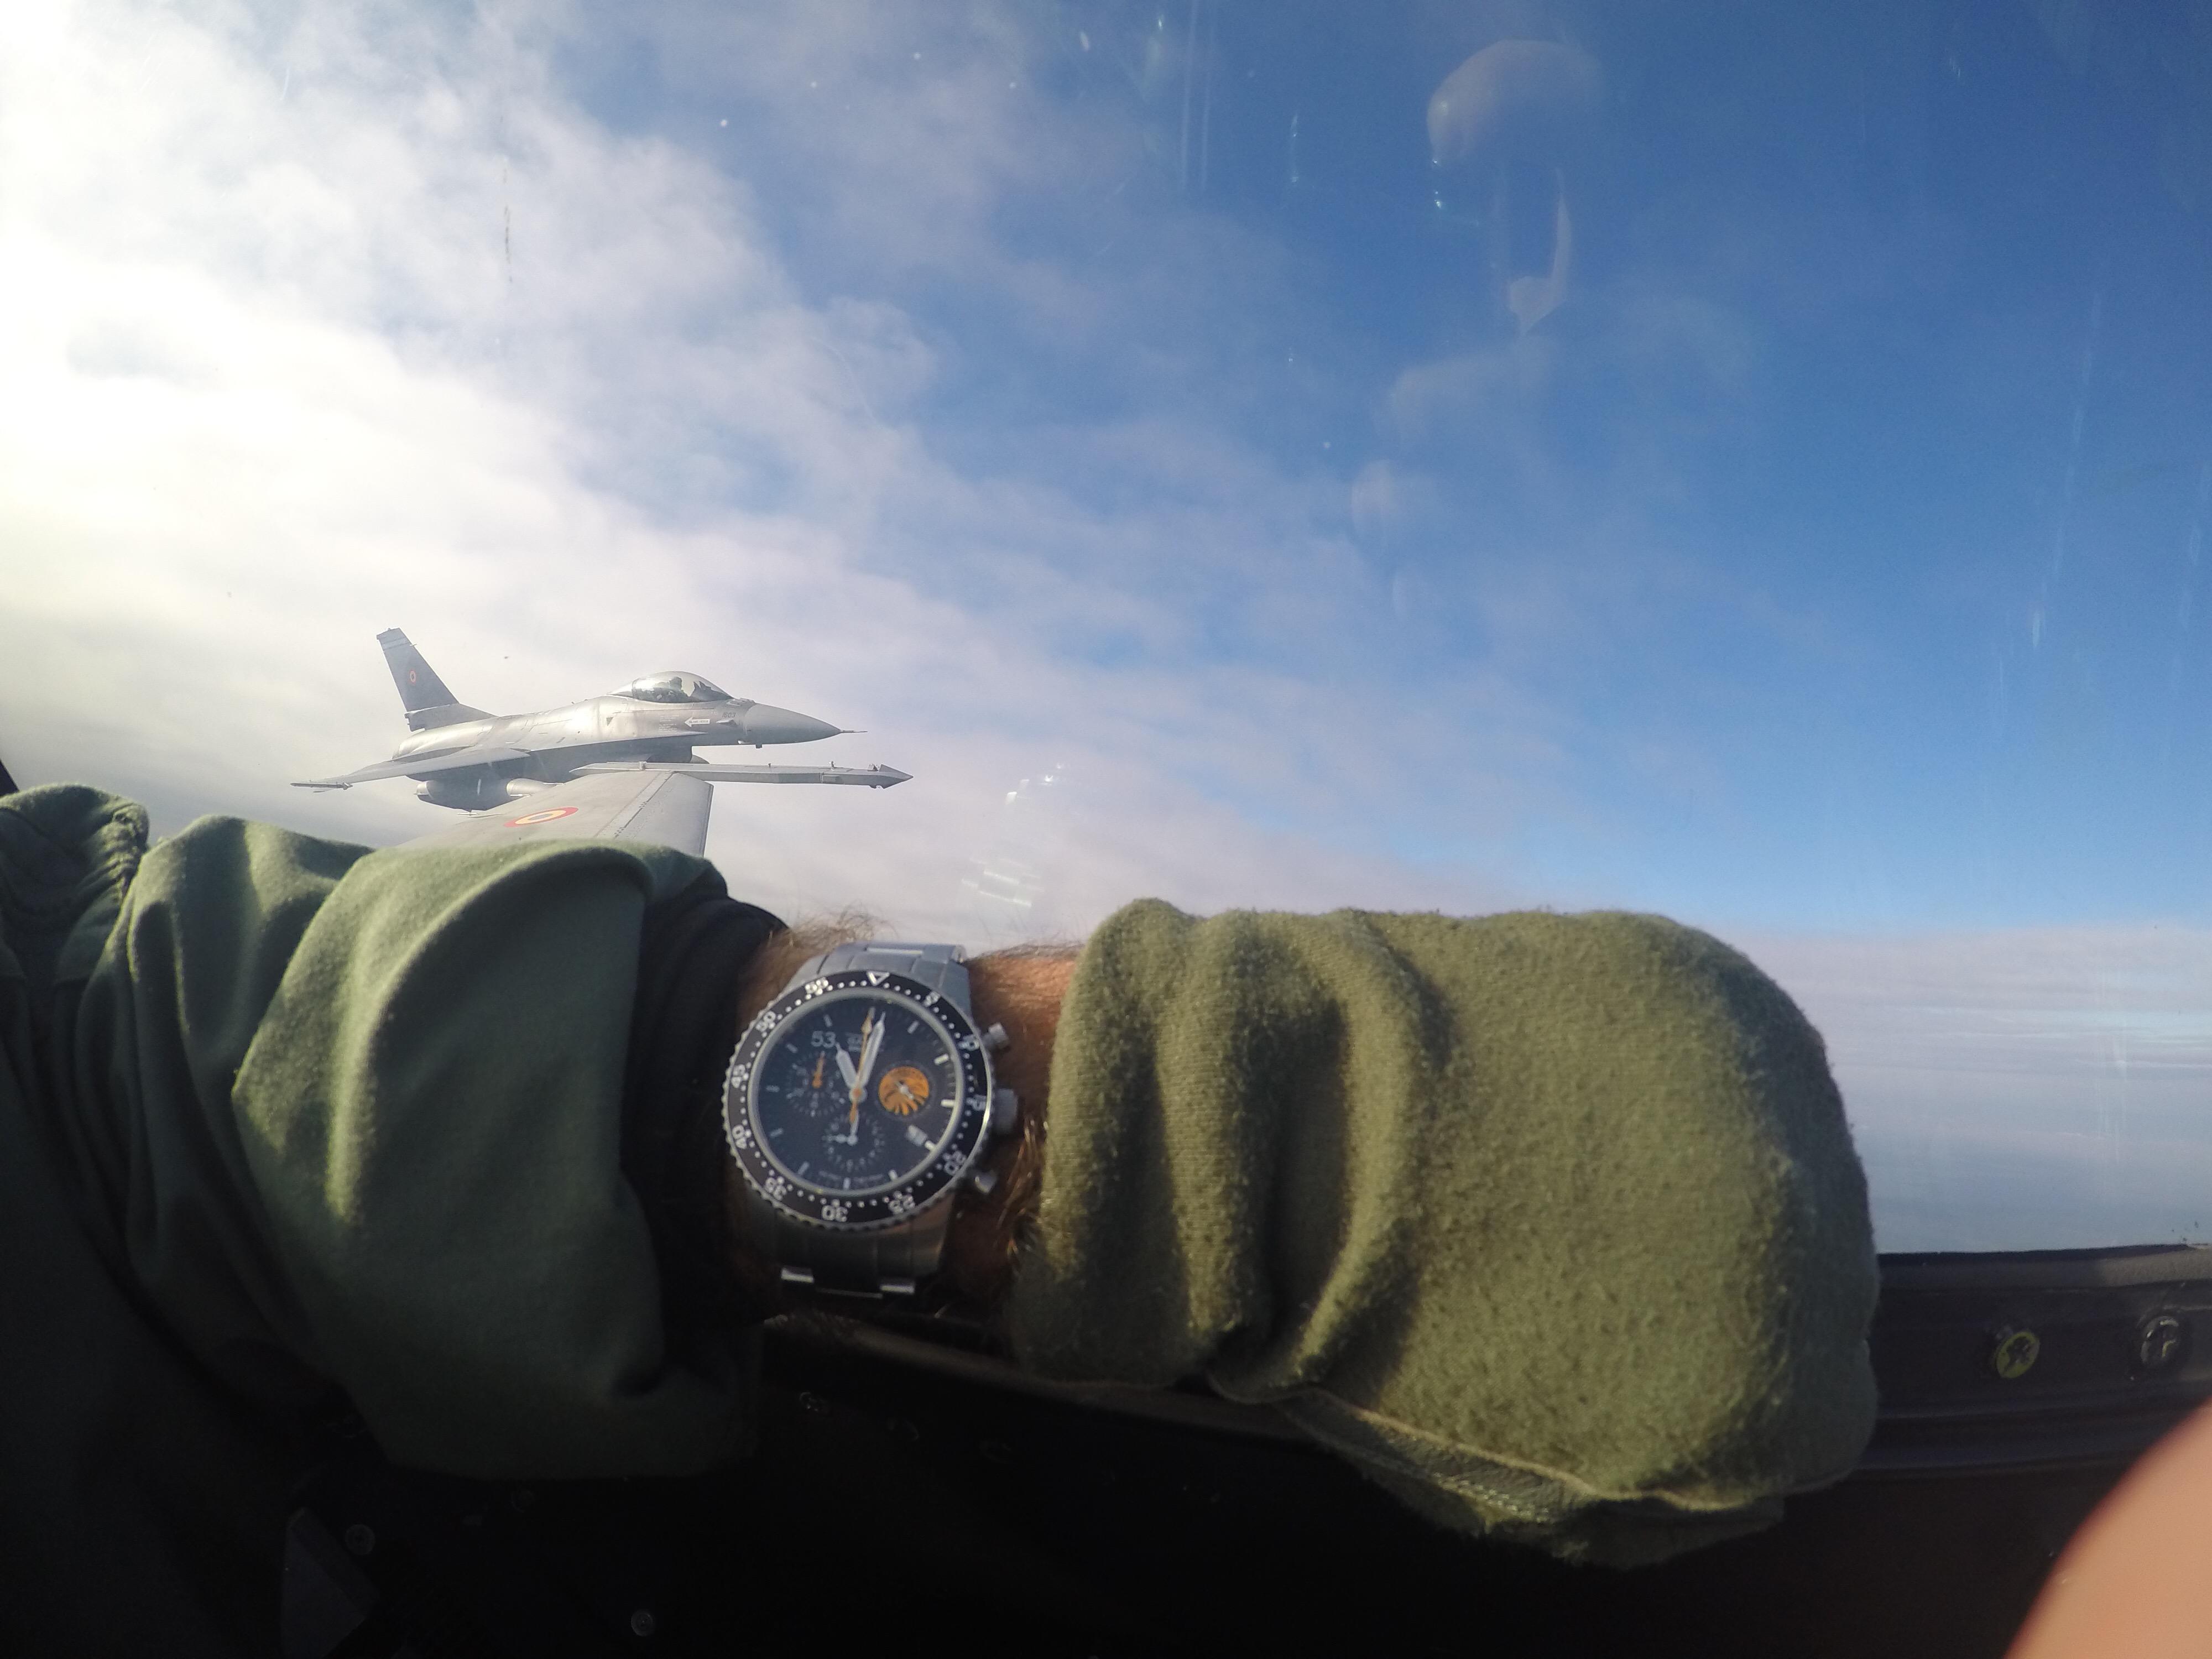 renseignements : marques de montres belges ? IMG_4304